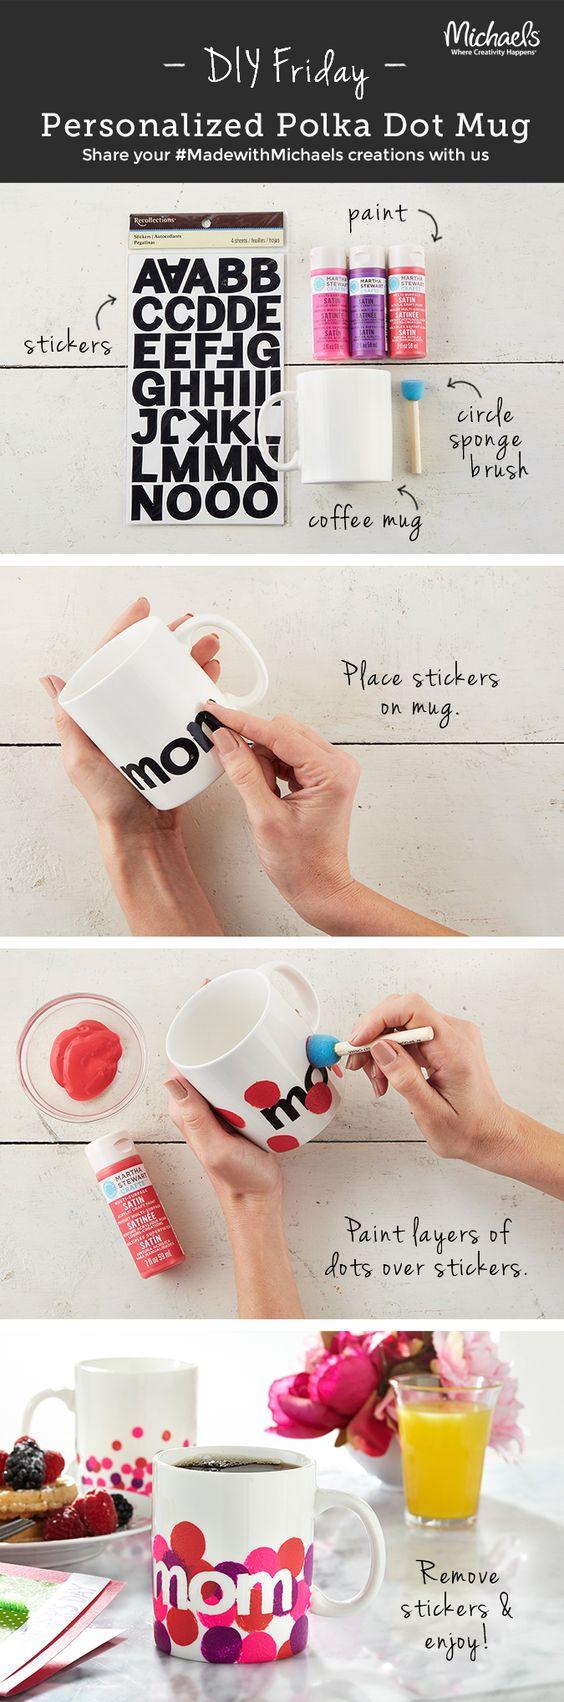 diy-gifts-designers-painted-mugs